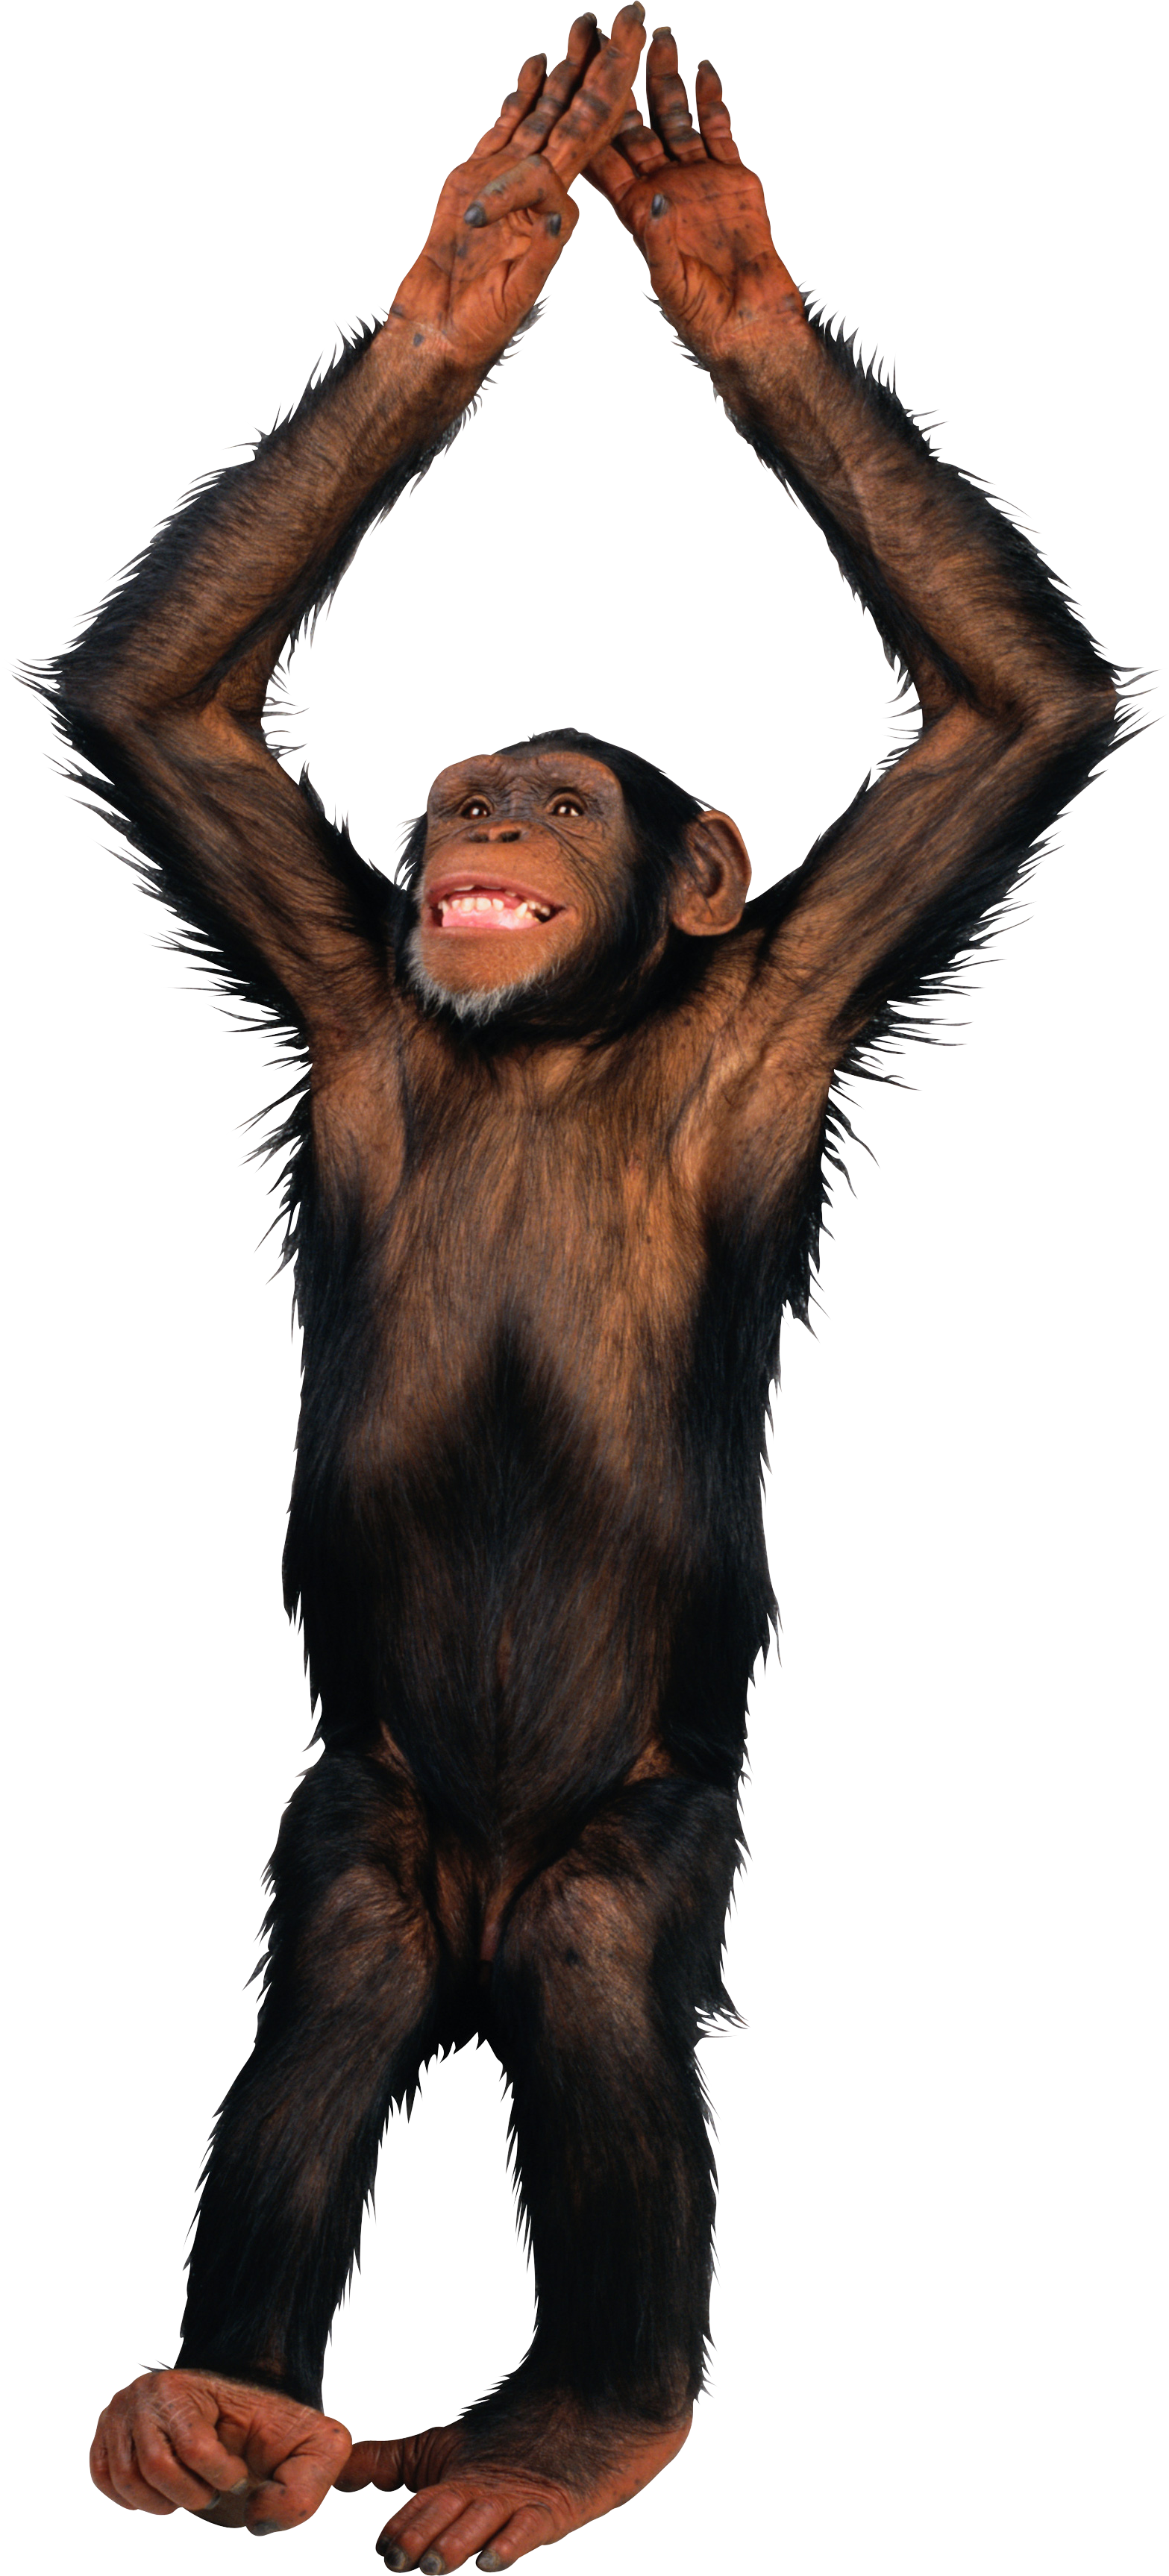 Monkey png images pinterest. Manatee clipart transparent background